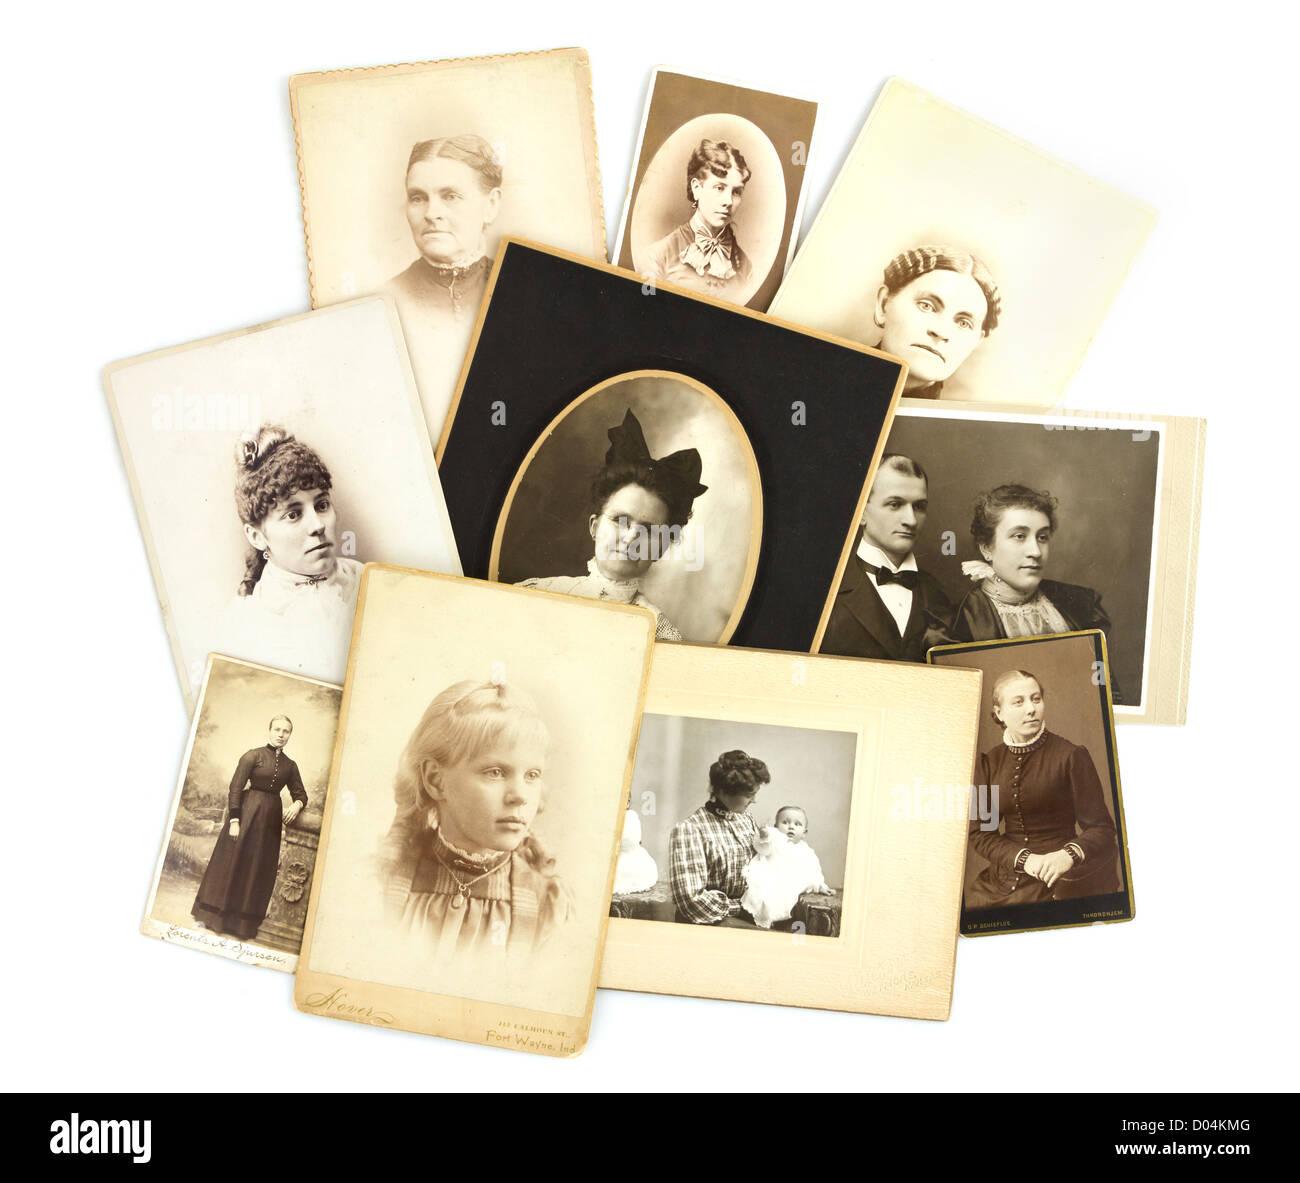 Antique Photos Collage on Isolated White Background - Stock Image